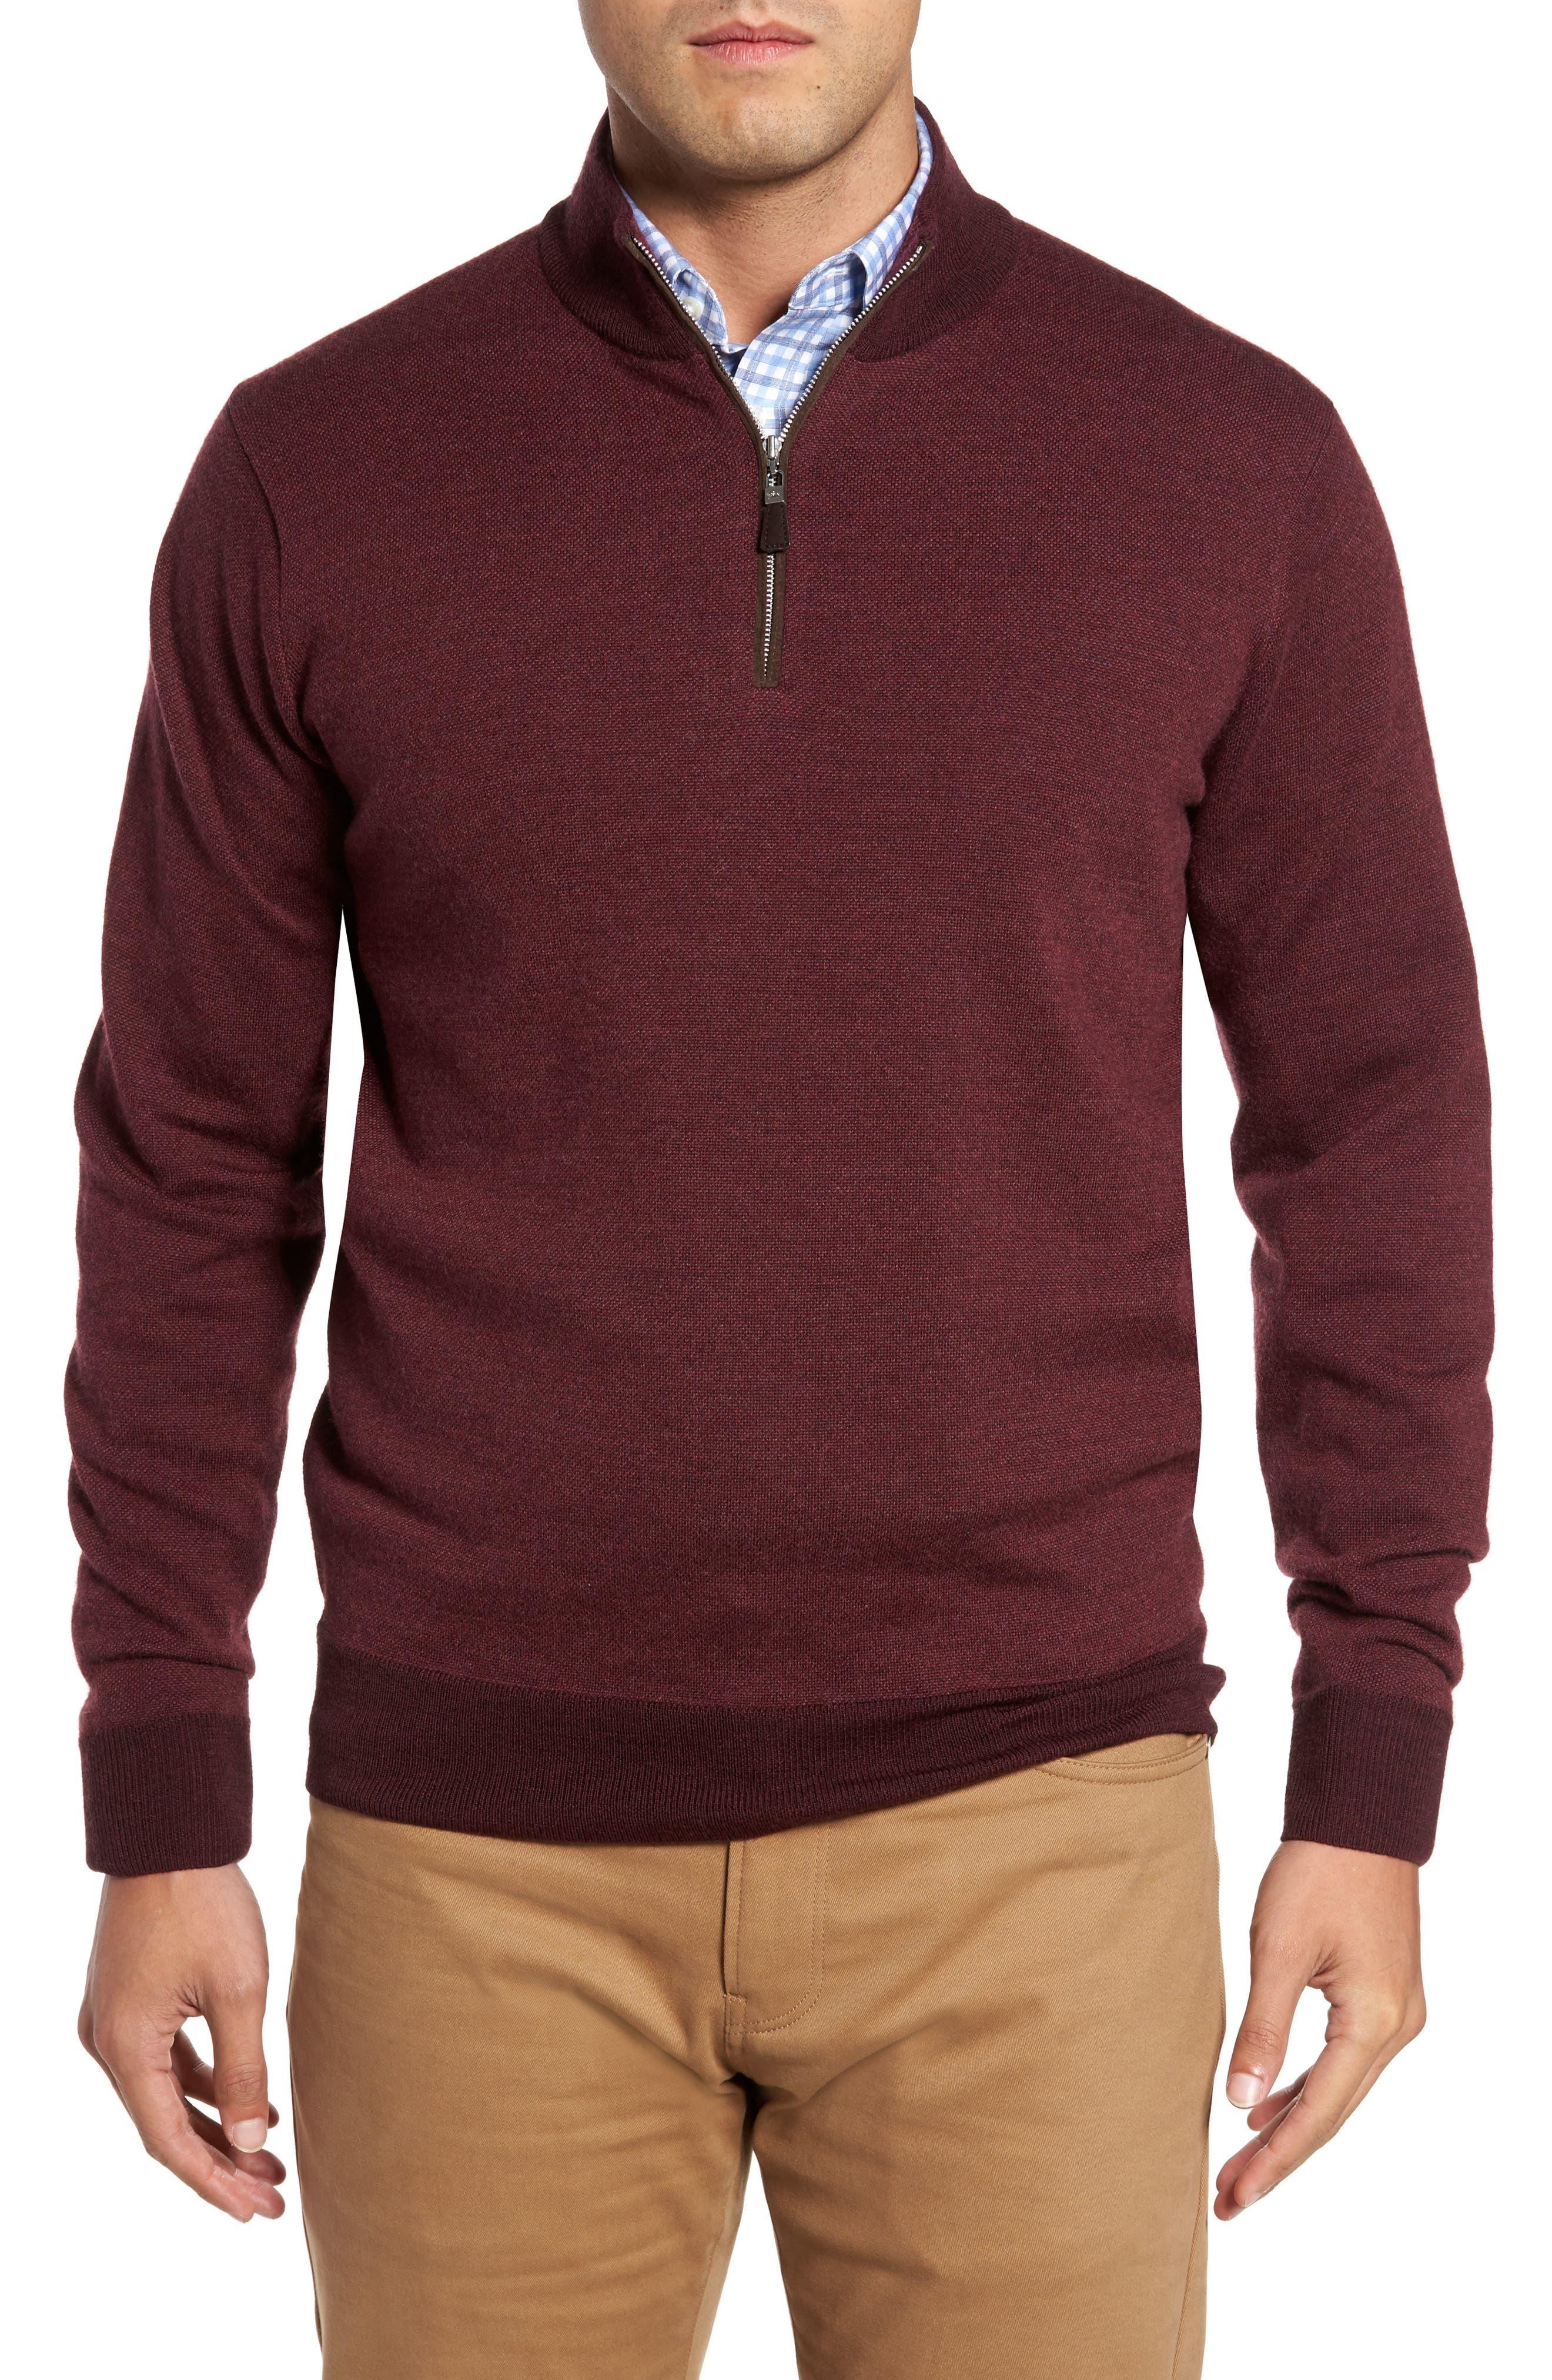 Main Image - Peter Millar Quarter Zip Wool Pullover